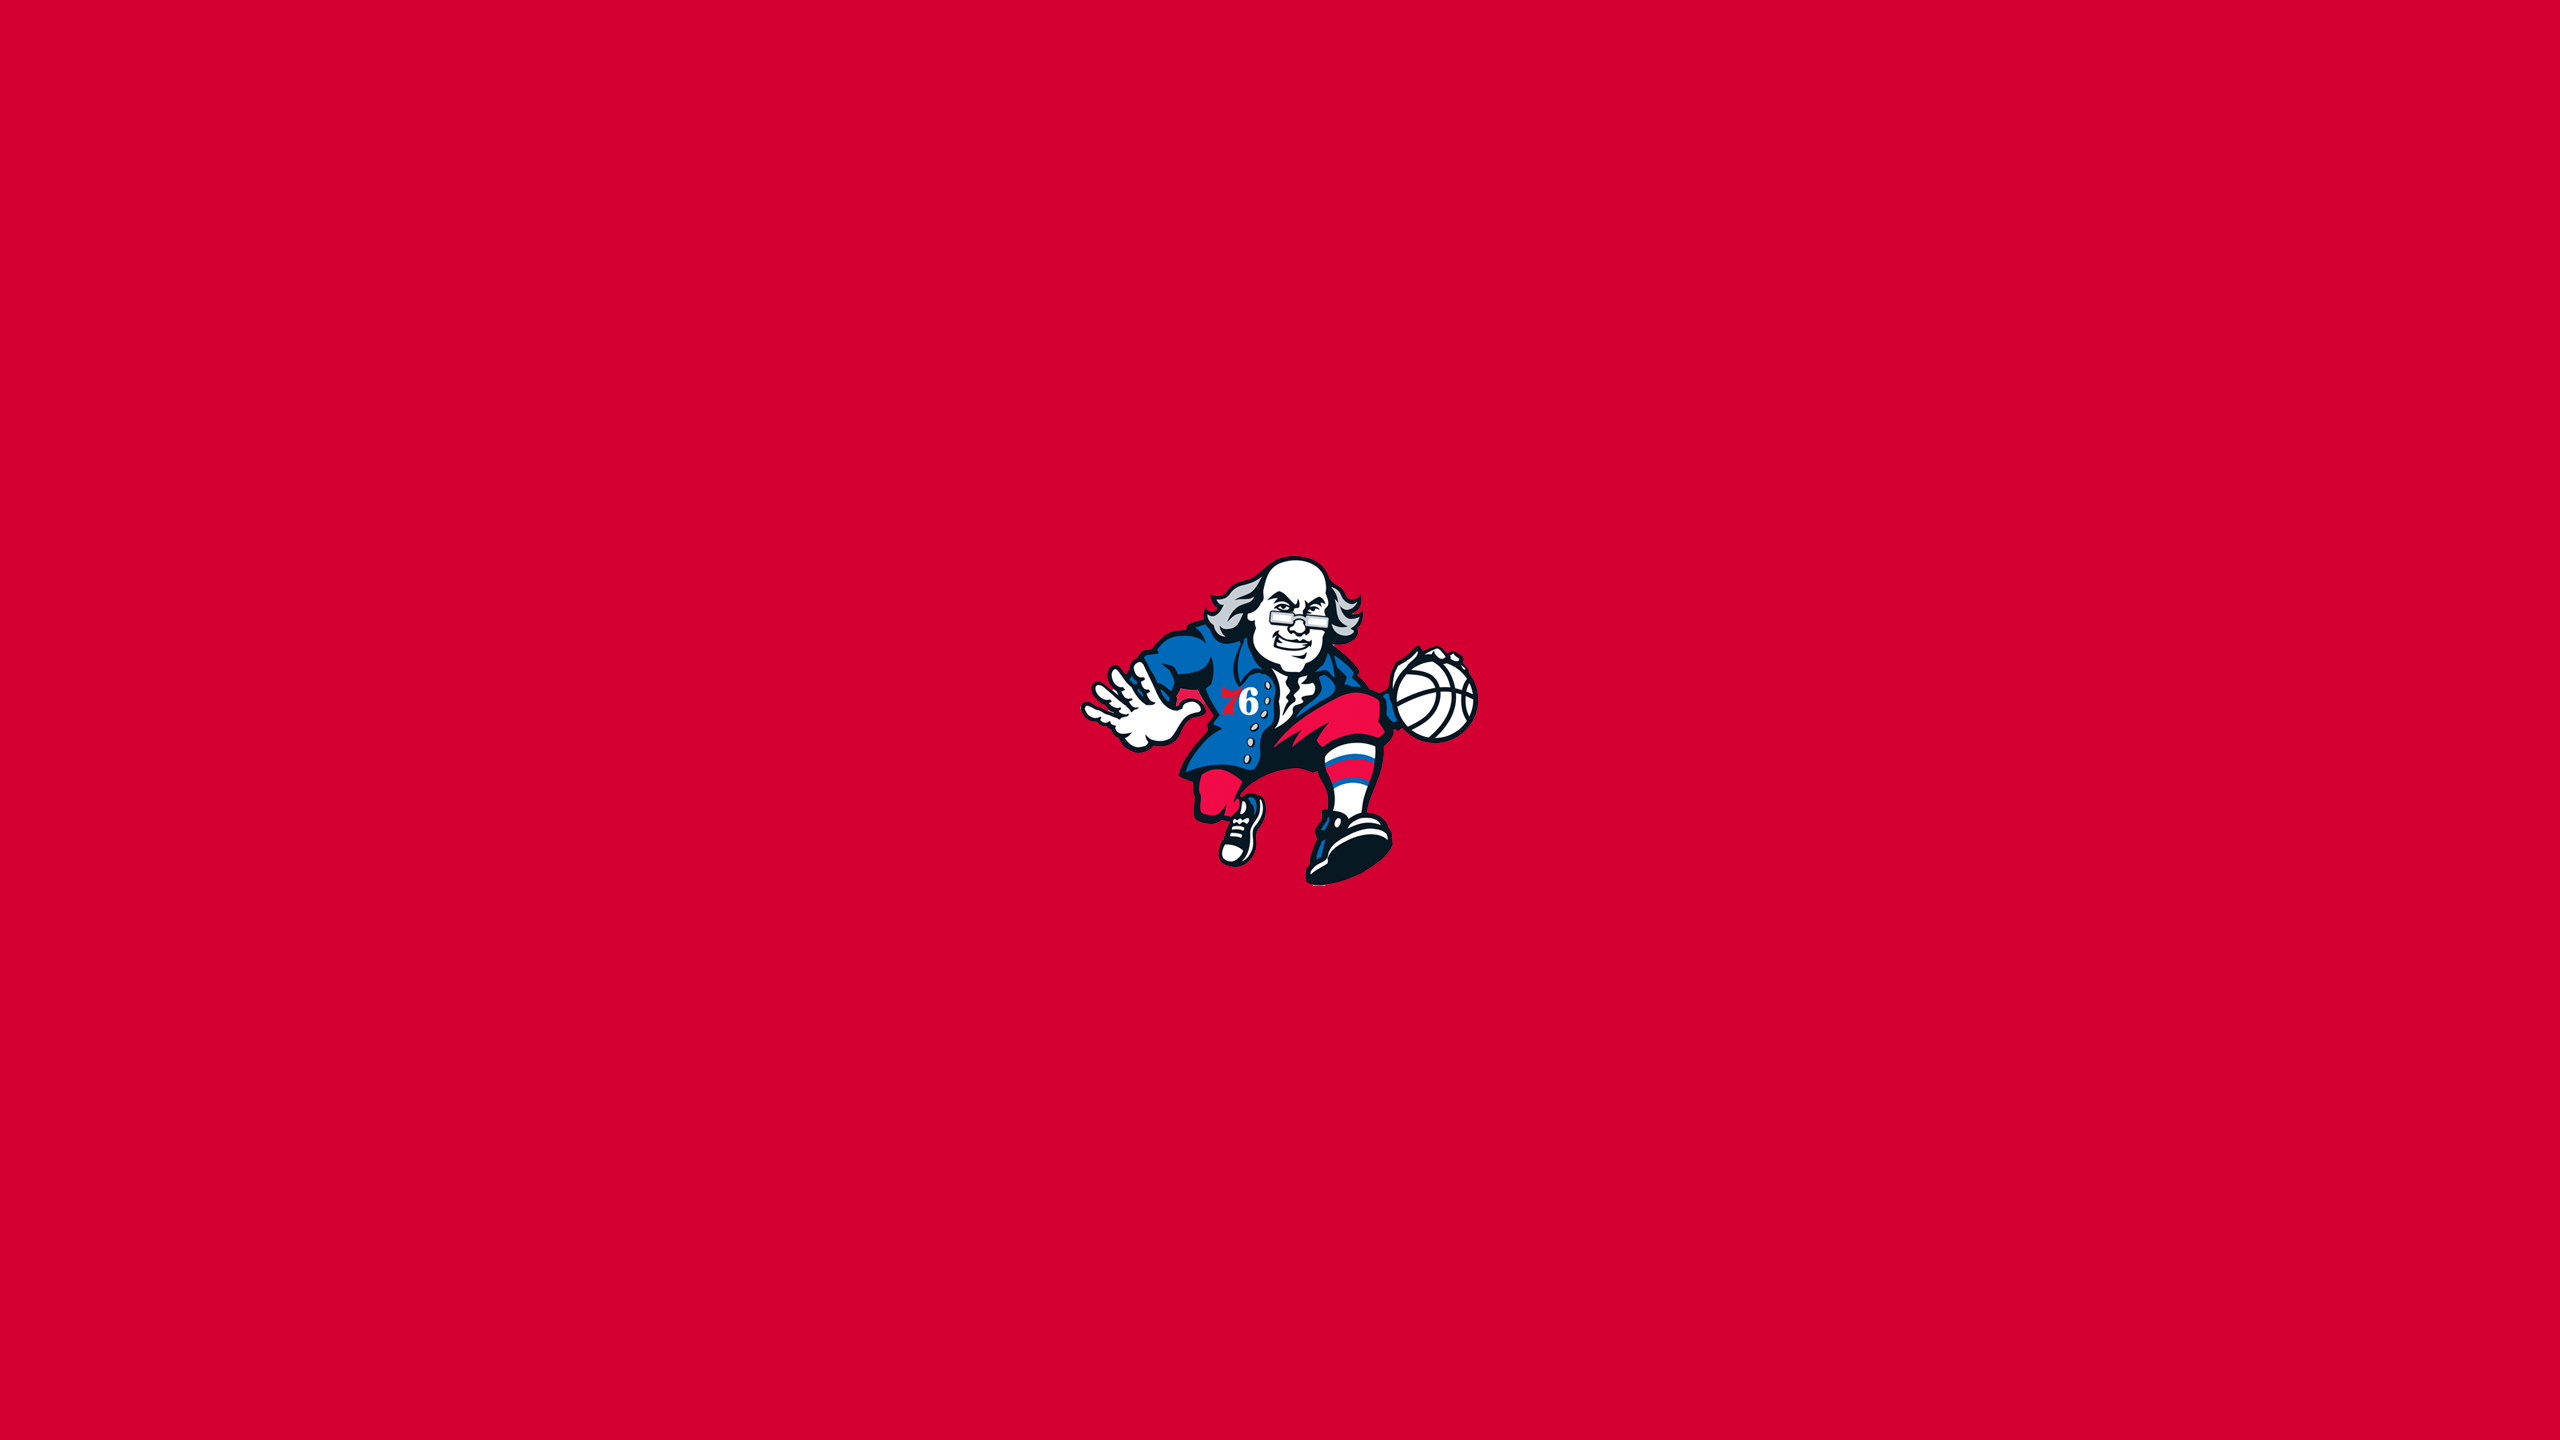 Philadelphia 76ers (Ben Franklin)